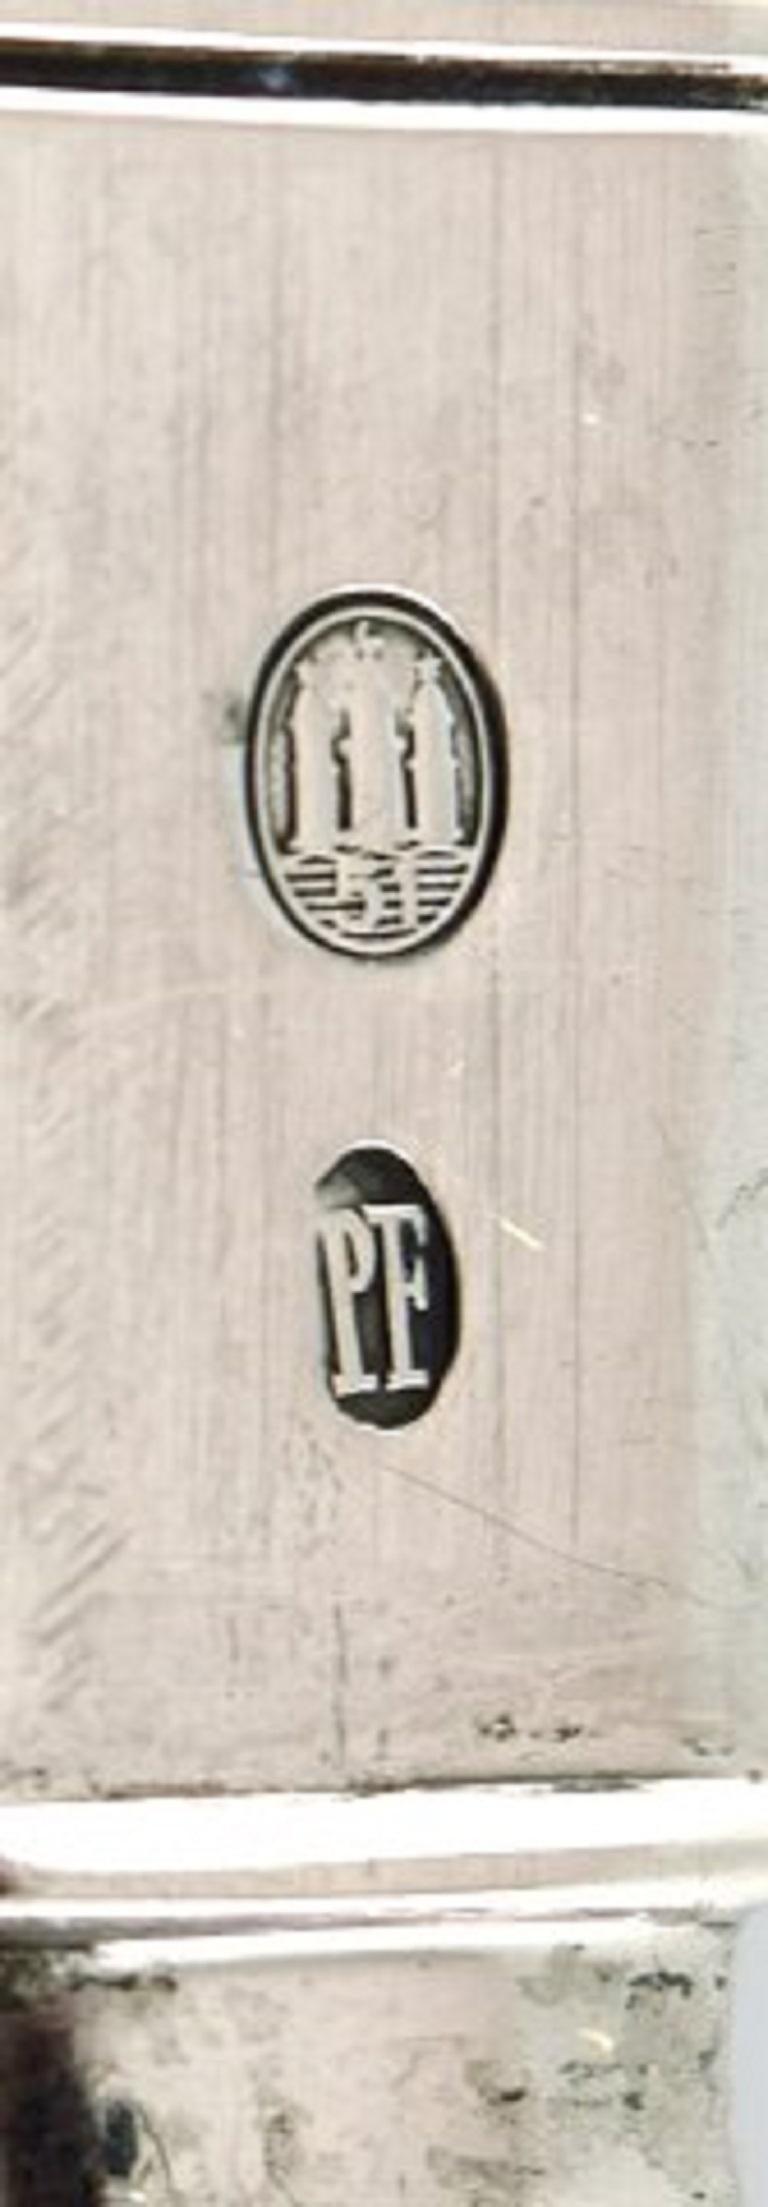 Poul Frigast, Danish Silversmith, Cake Knife in Silver, 1951 In Good Condition For Sale In Copenhagen, Denmark